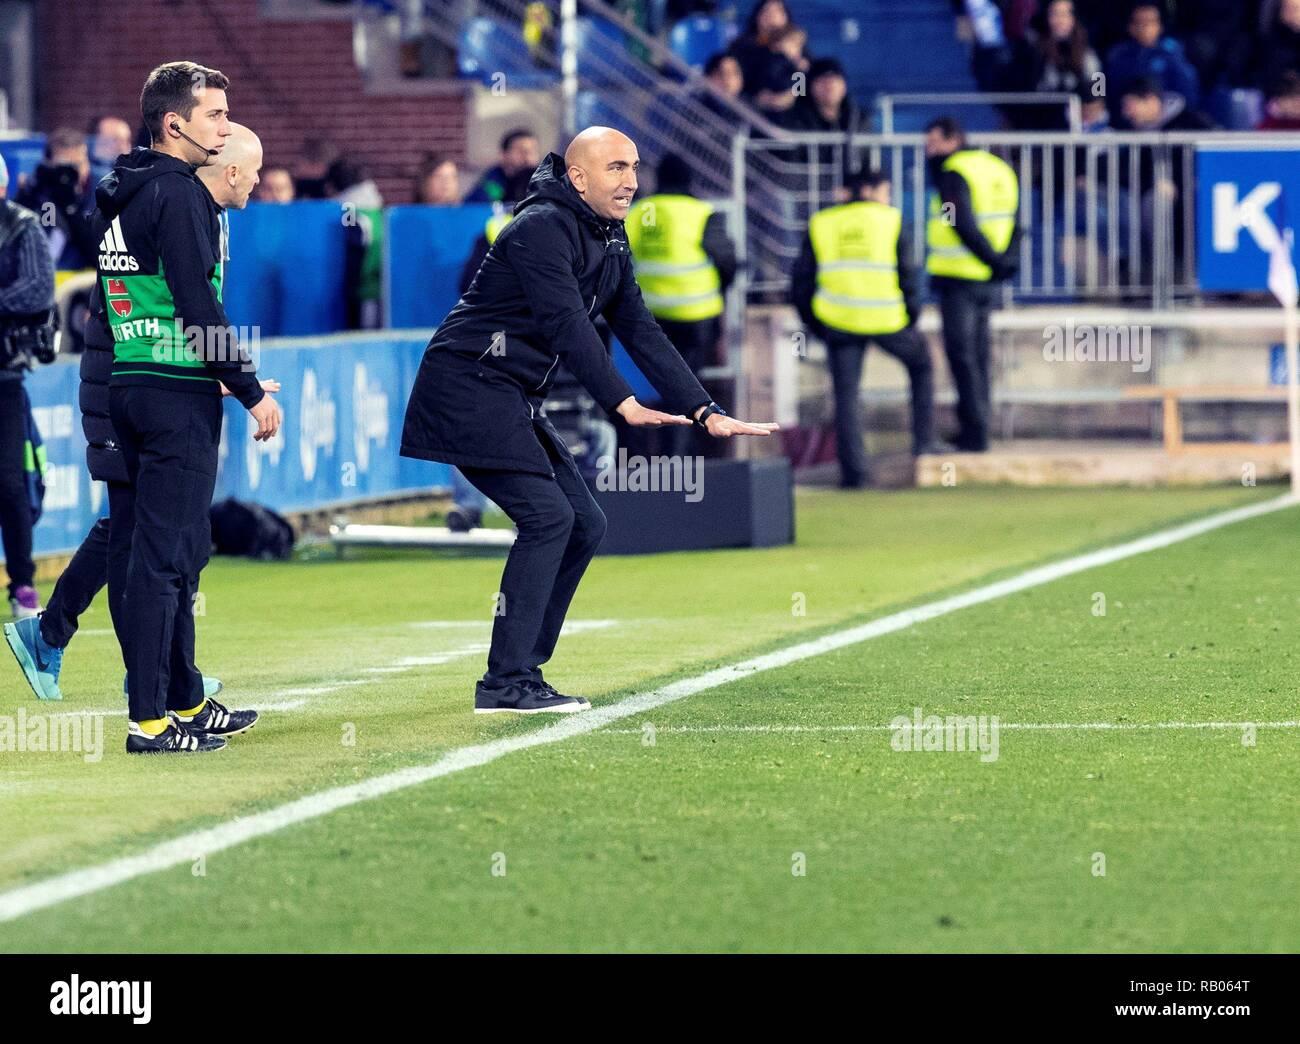 Reacts During Spanish LaLiga Match Between Alaves And Valencia At Mendizorroza Stadium In Vitoria Spain 05 January 2019 Credit Adrian Ruiz Del